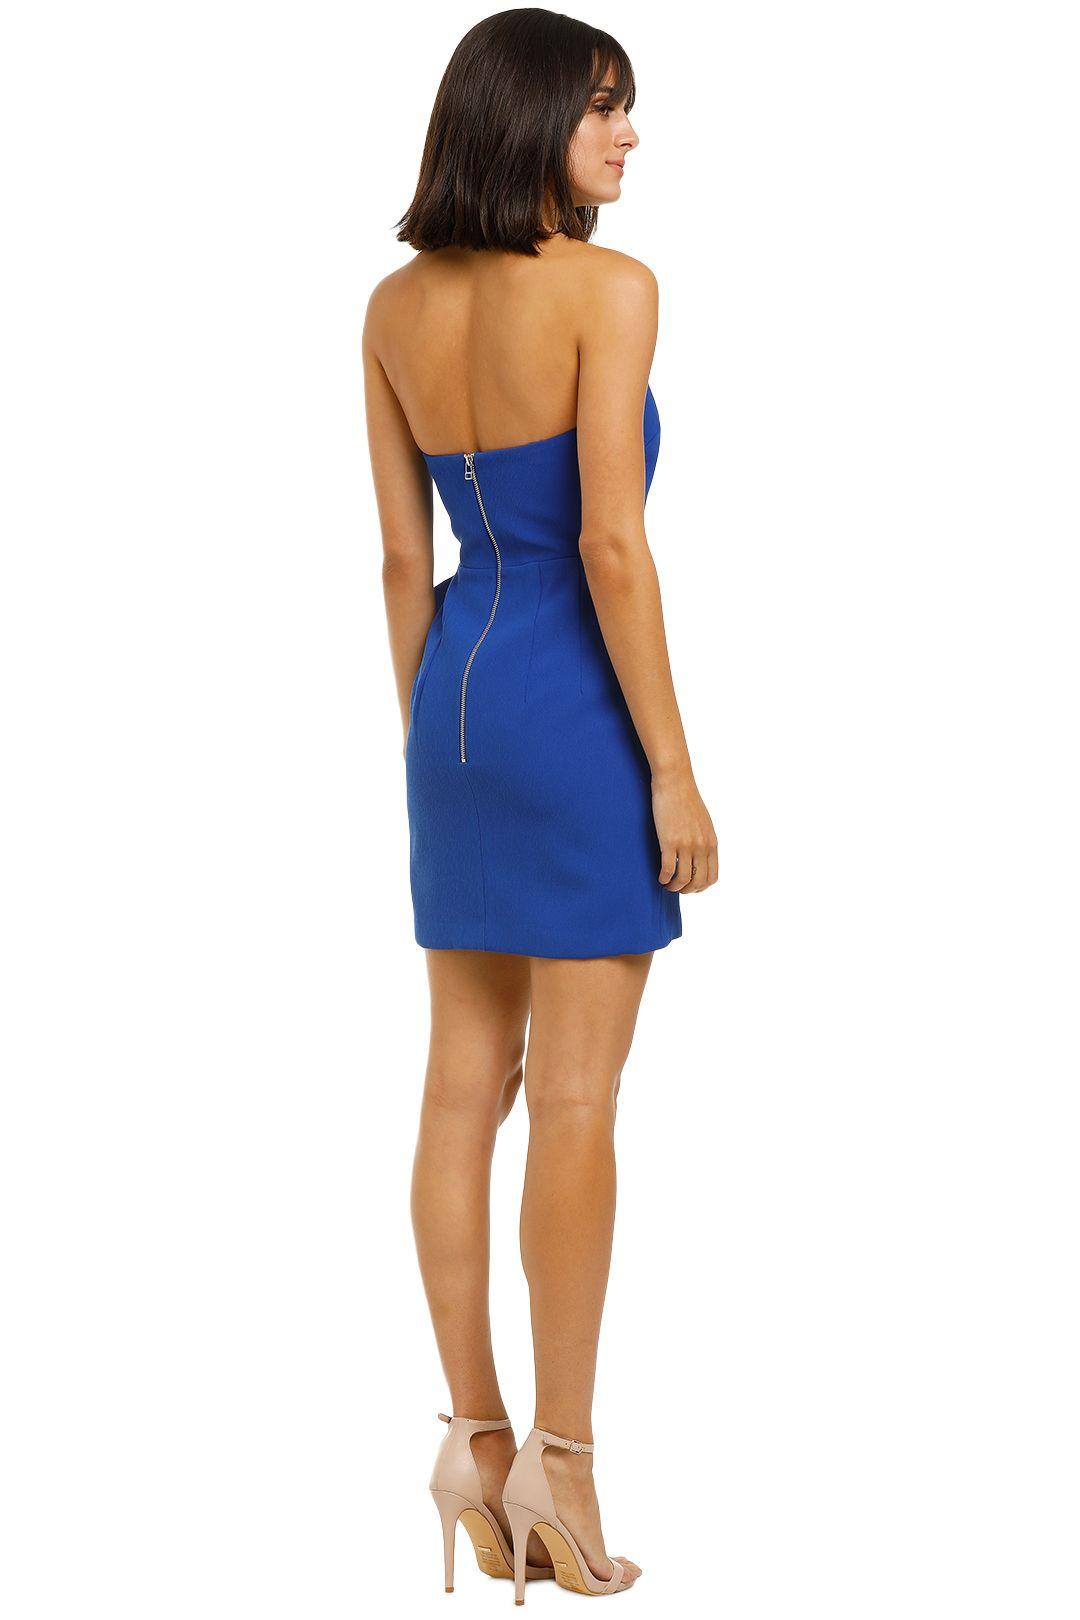 By-Johnny-Bow-Tie-Mini-Dress-Cobalt-Back